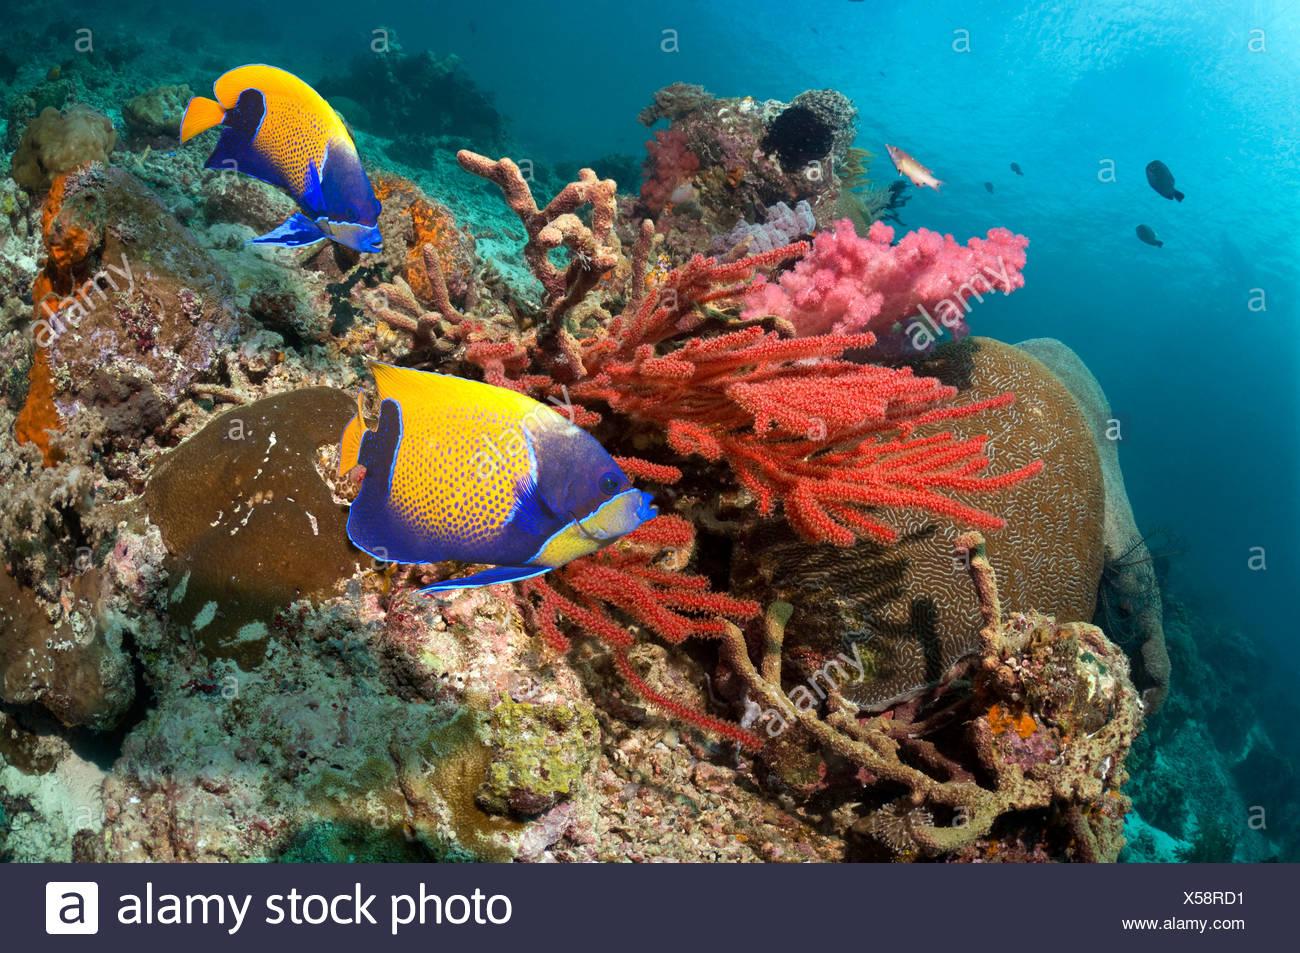 Blue-girdled angelfish swimming past soft coral on reef.  Misool, Raja Ampat, West Papua, Indonesia. - Stock Image